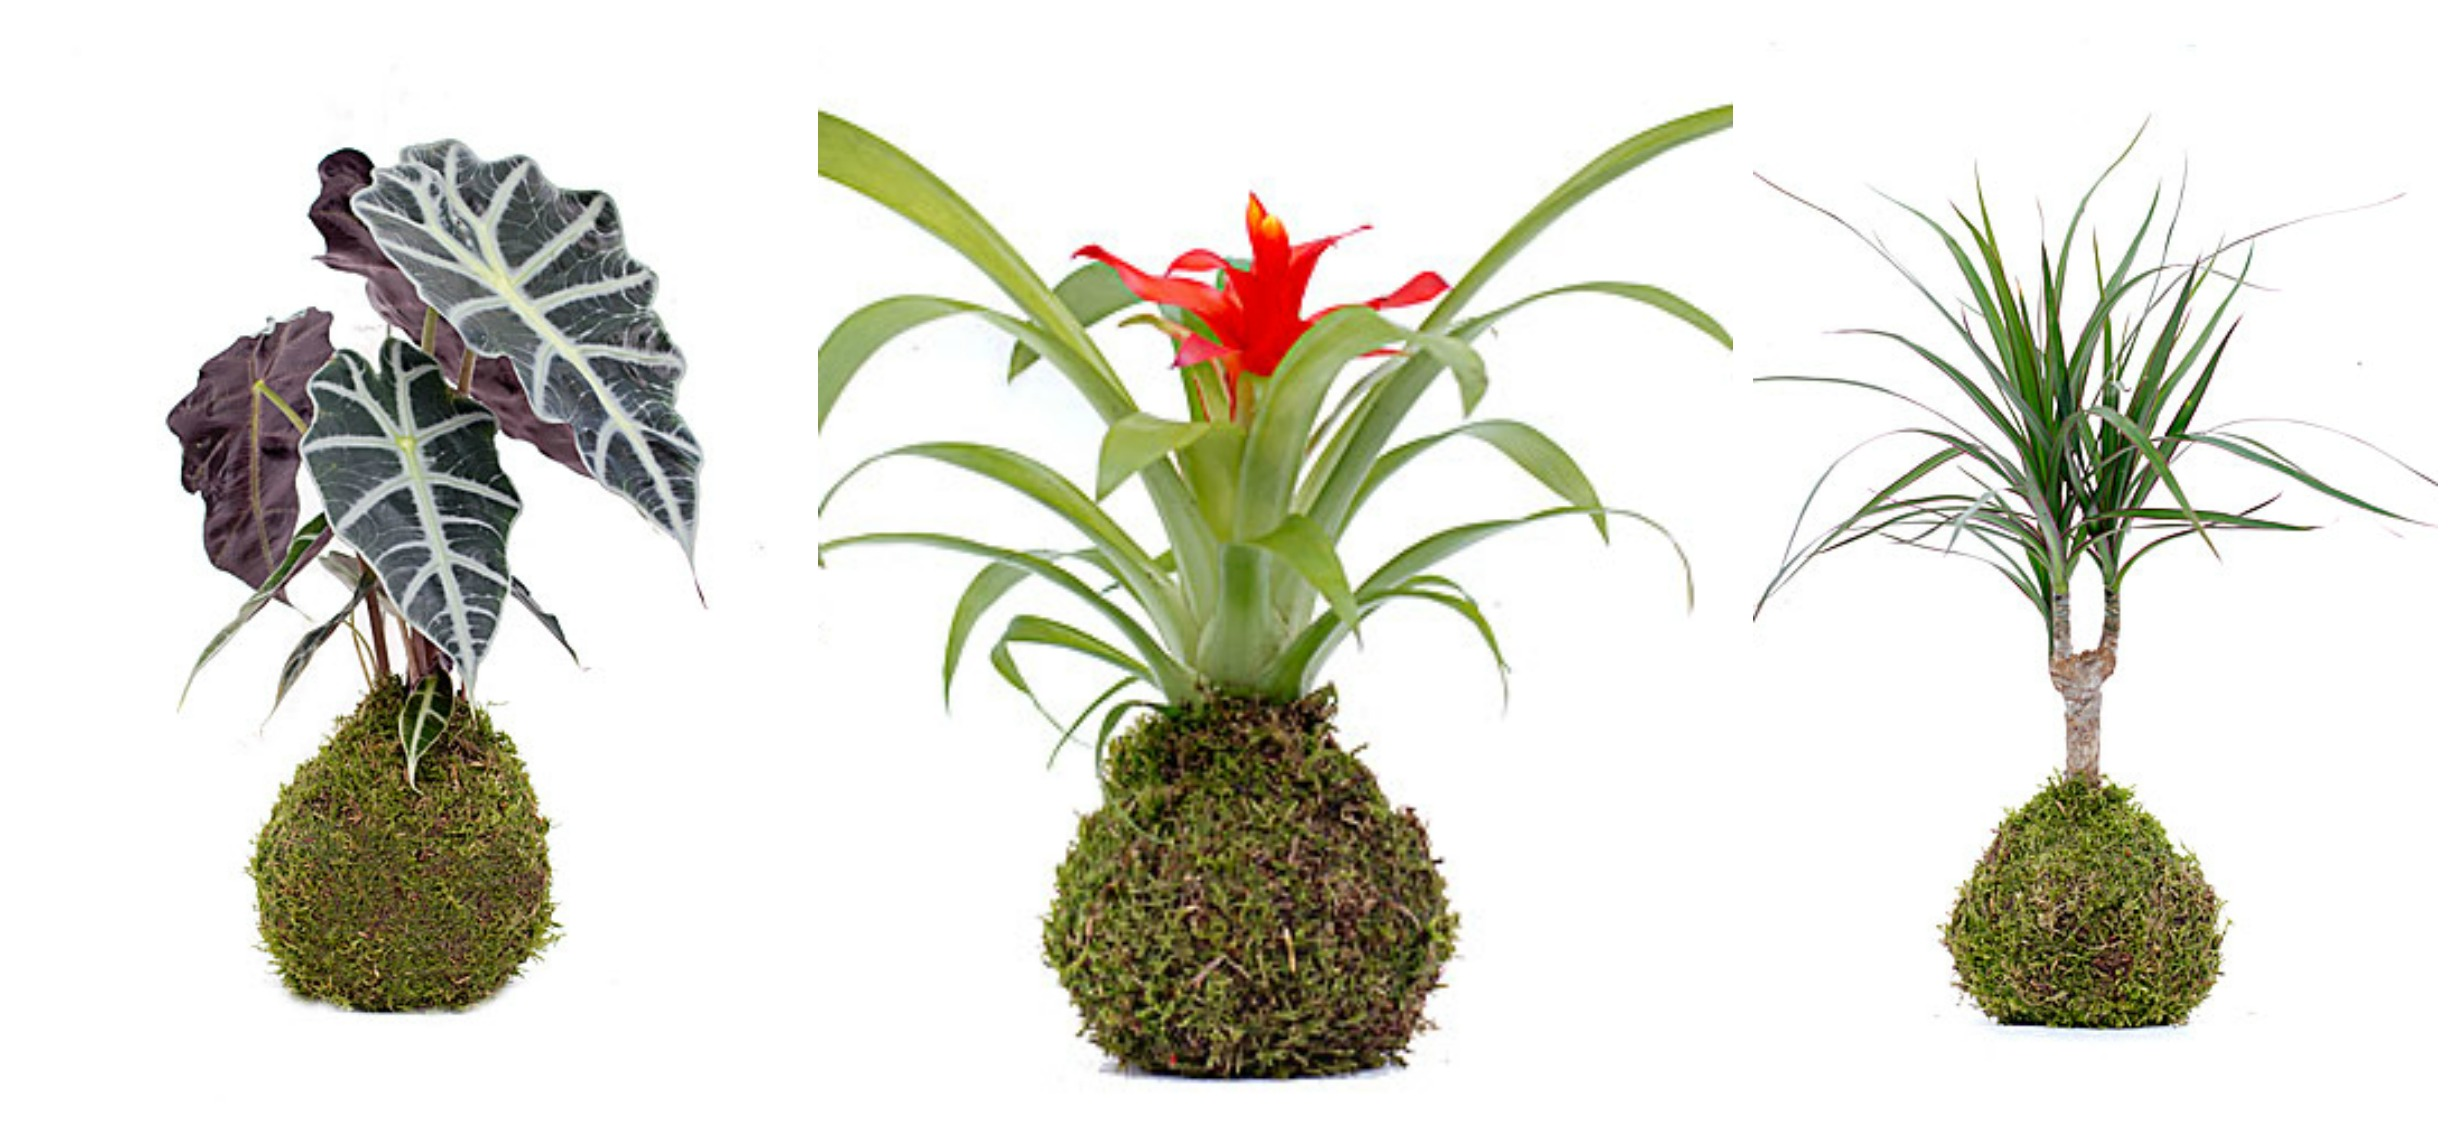 taller sobre plantas de interior en mugi 2demayobilbao